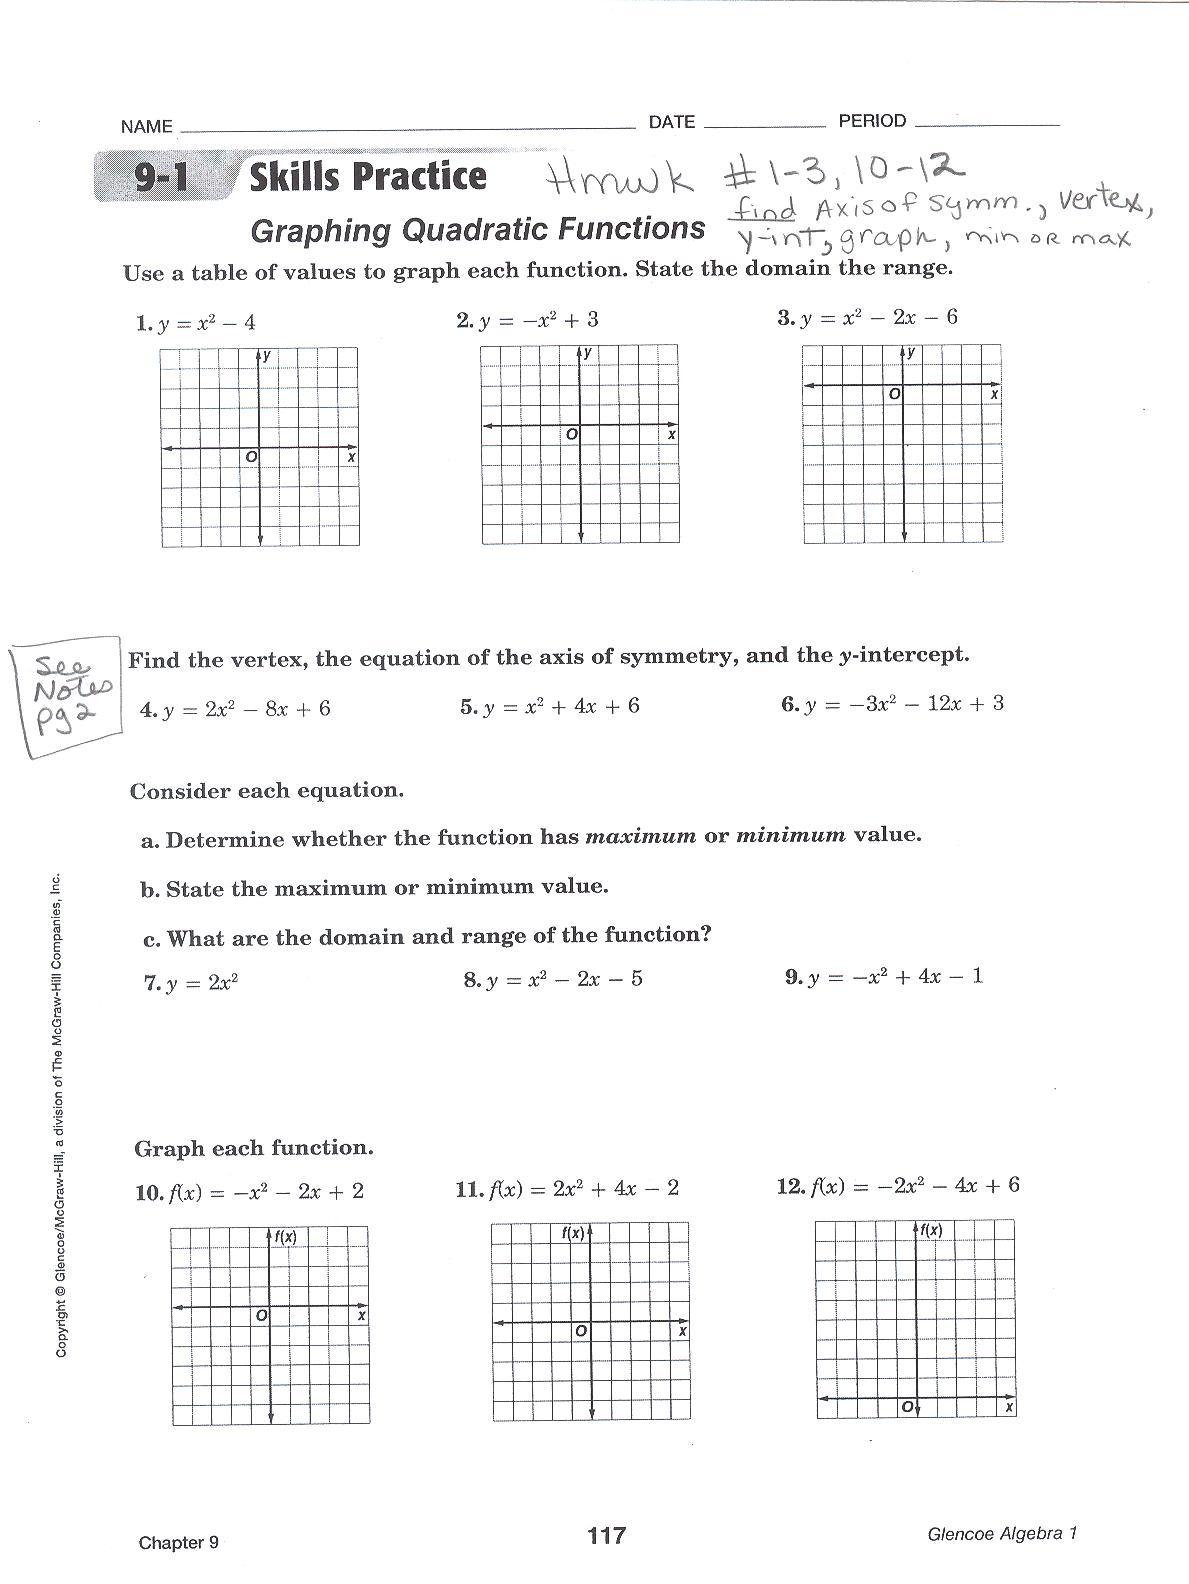 35 Graphing Quadratic Functions Practice Worksheet